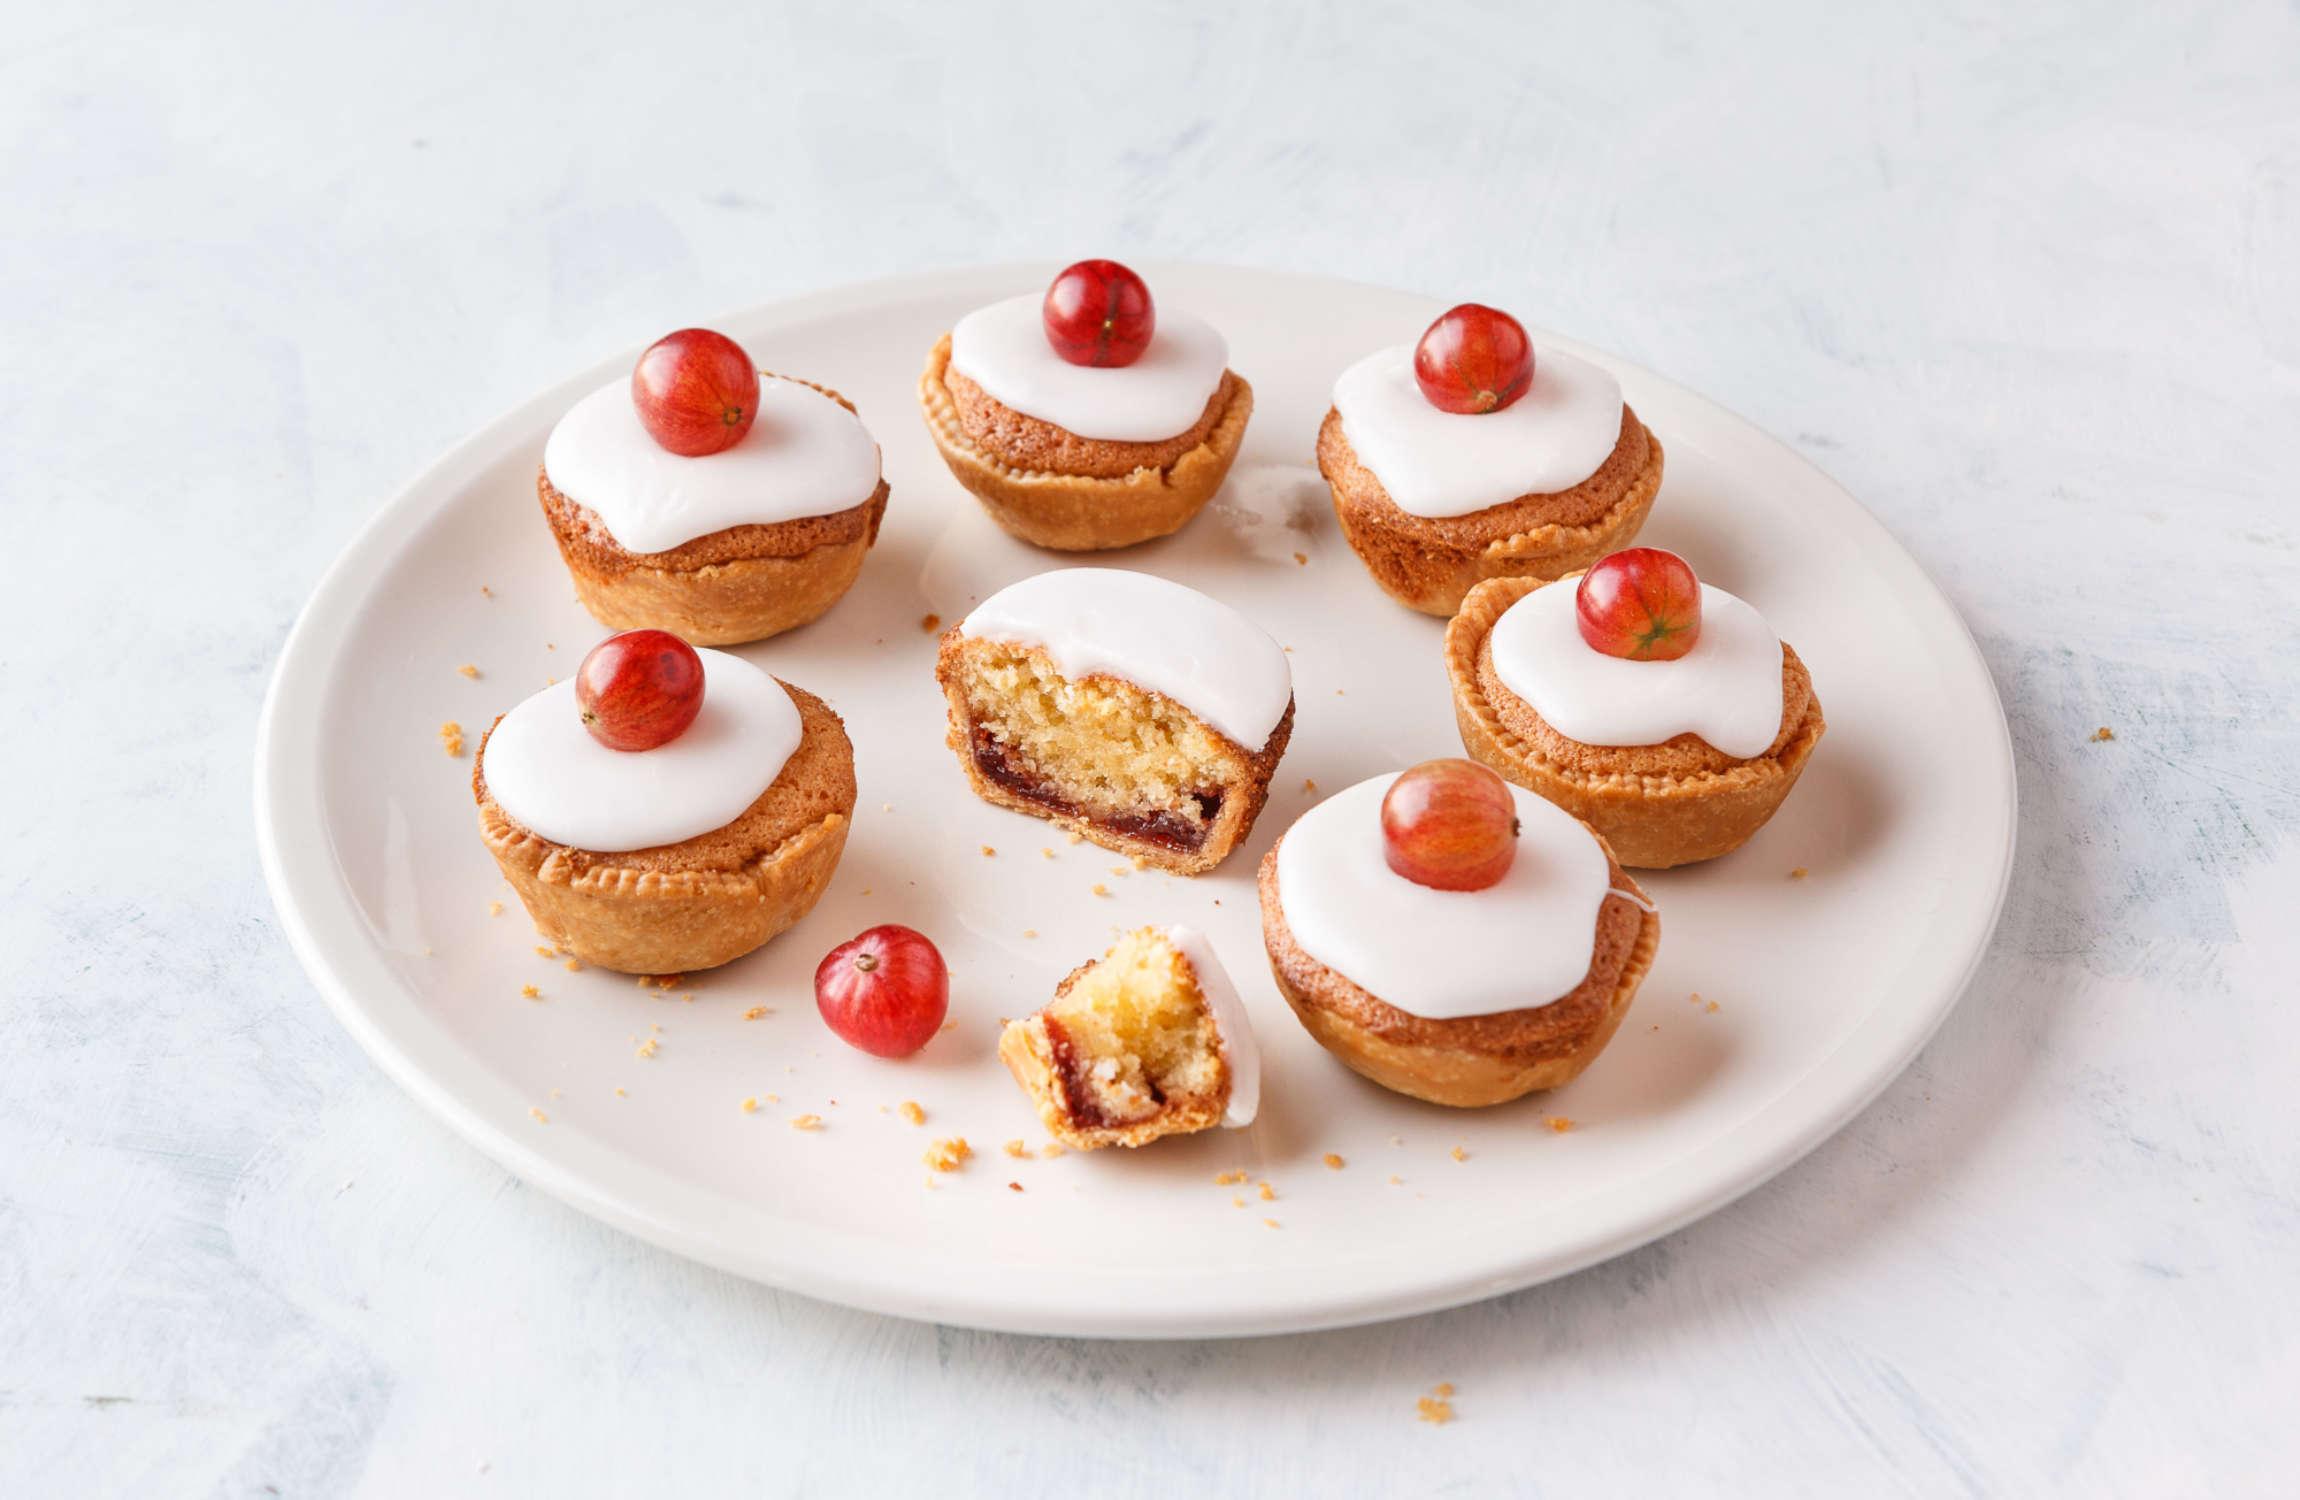 Red Gooseberry Bakewell Tarts